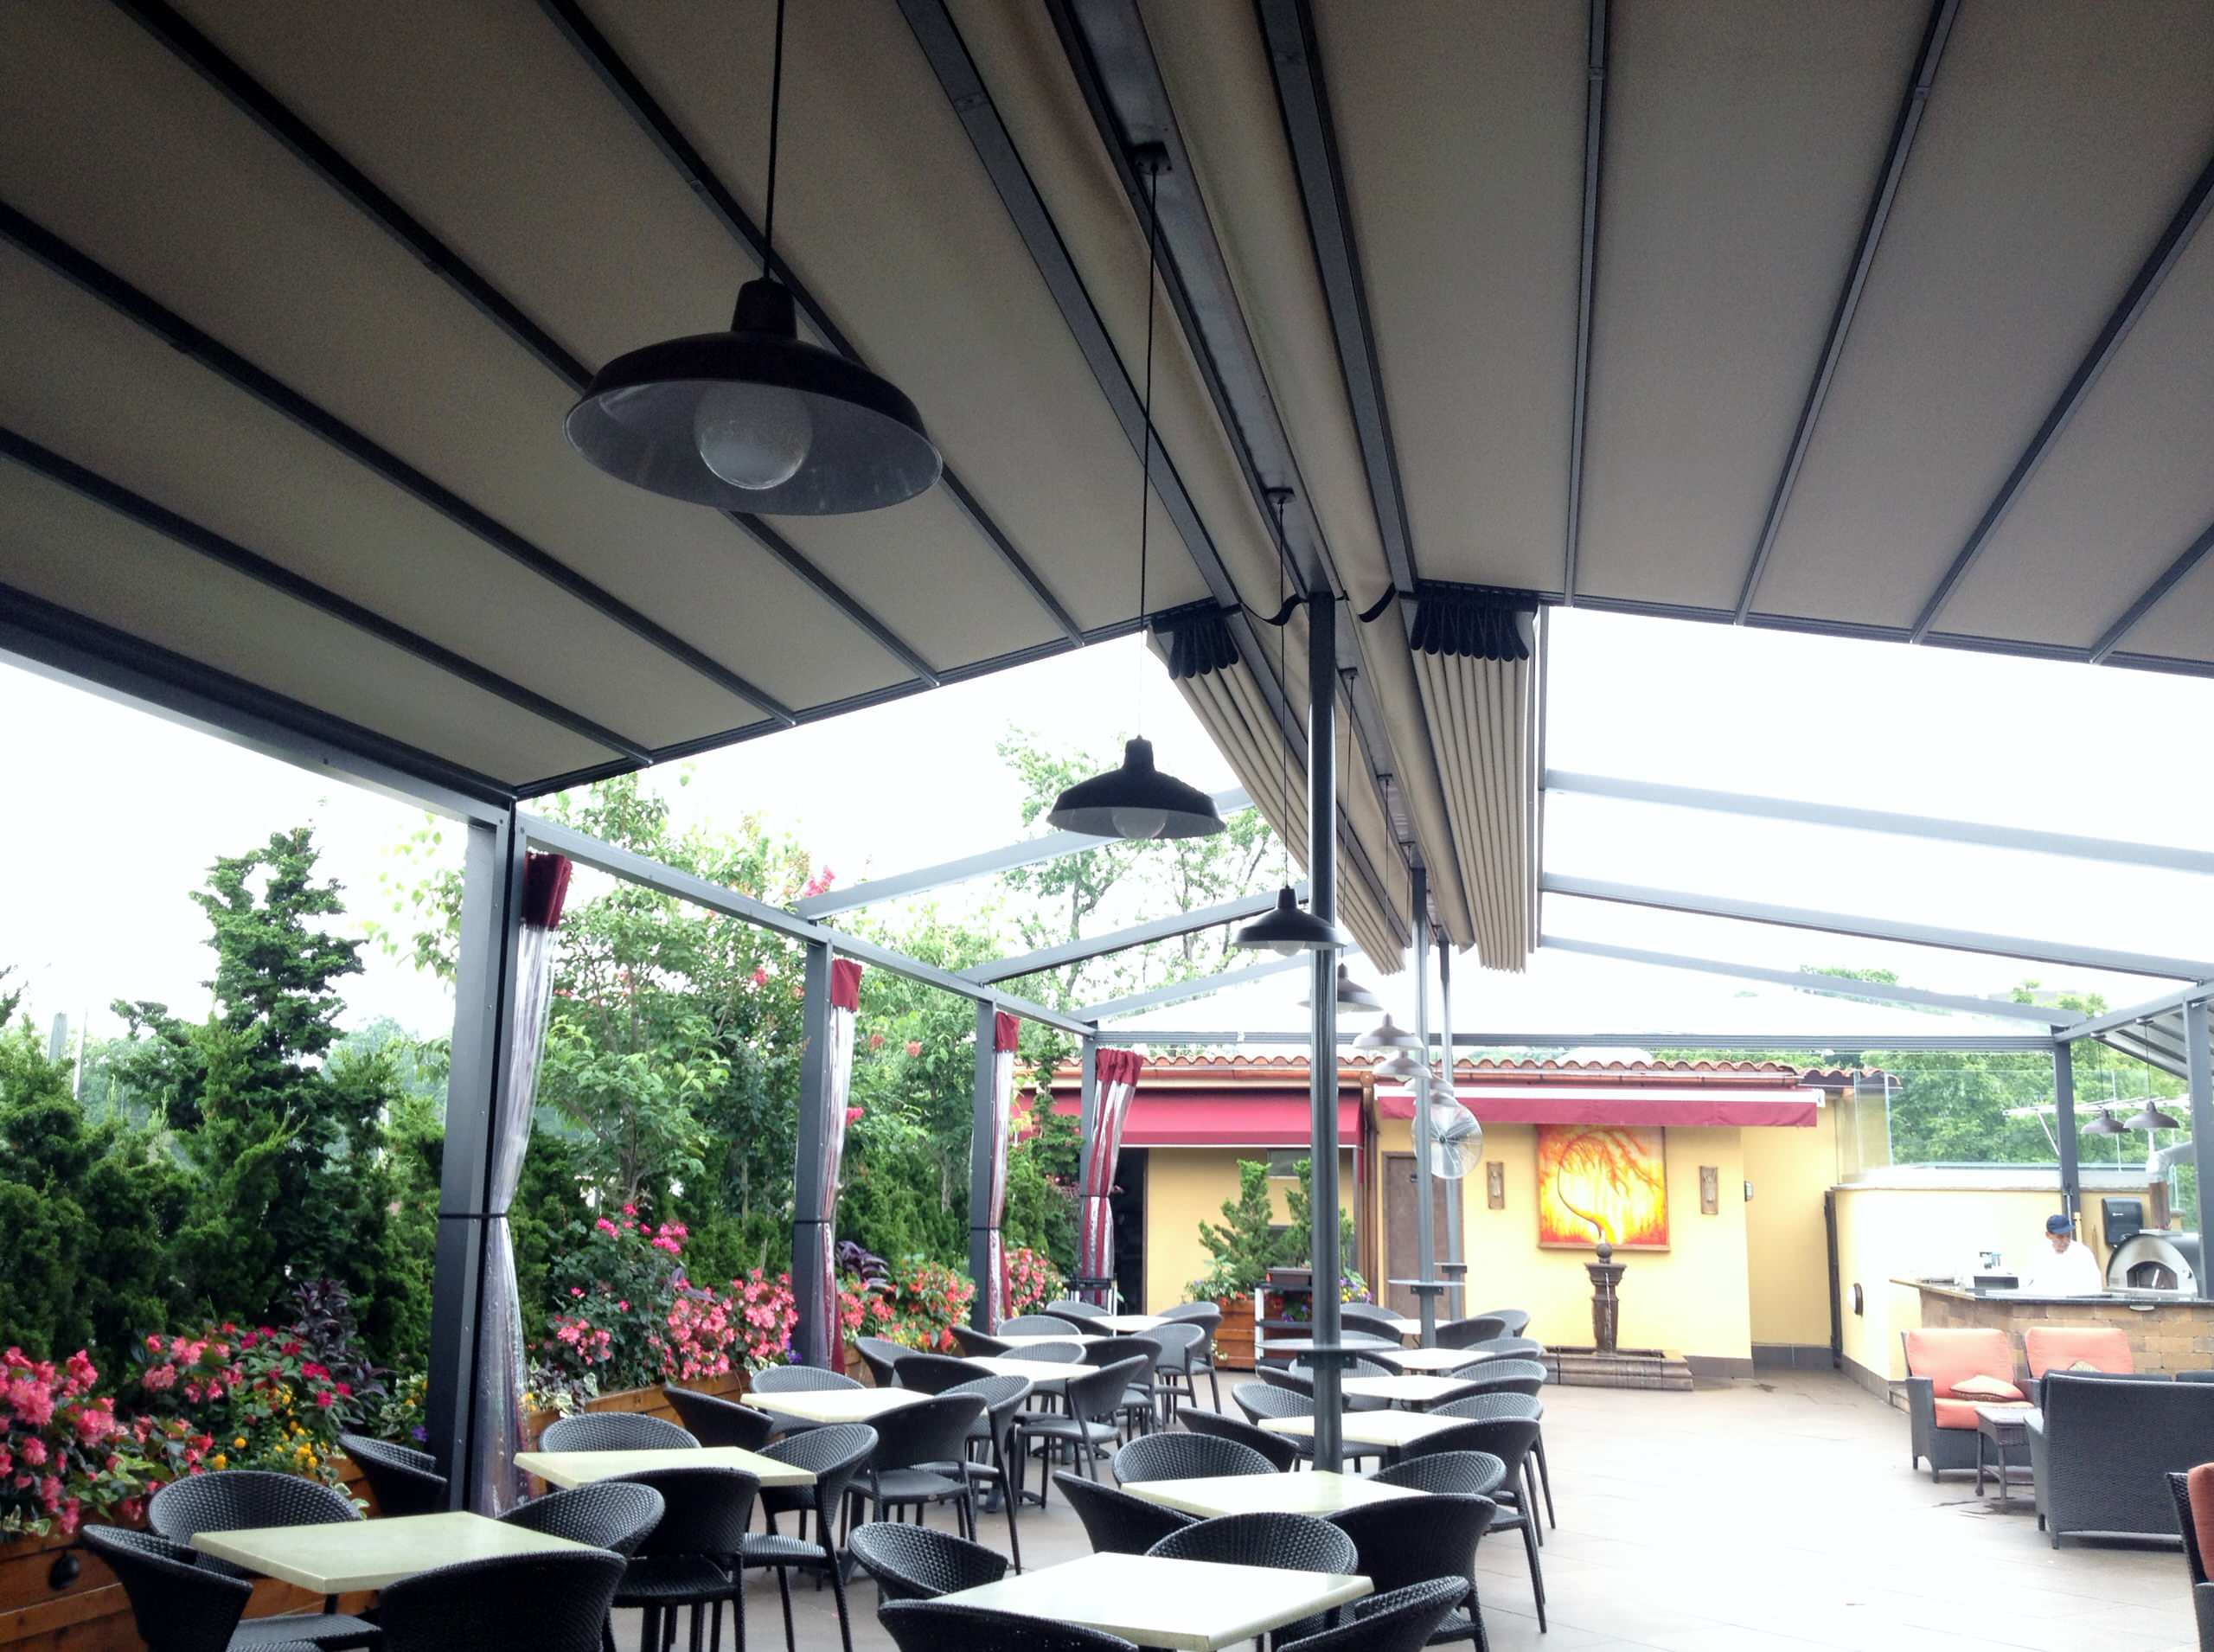 restaurant patio ideas photos houzz